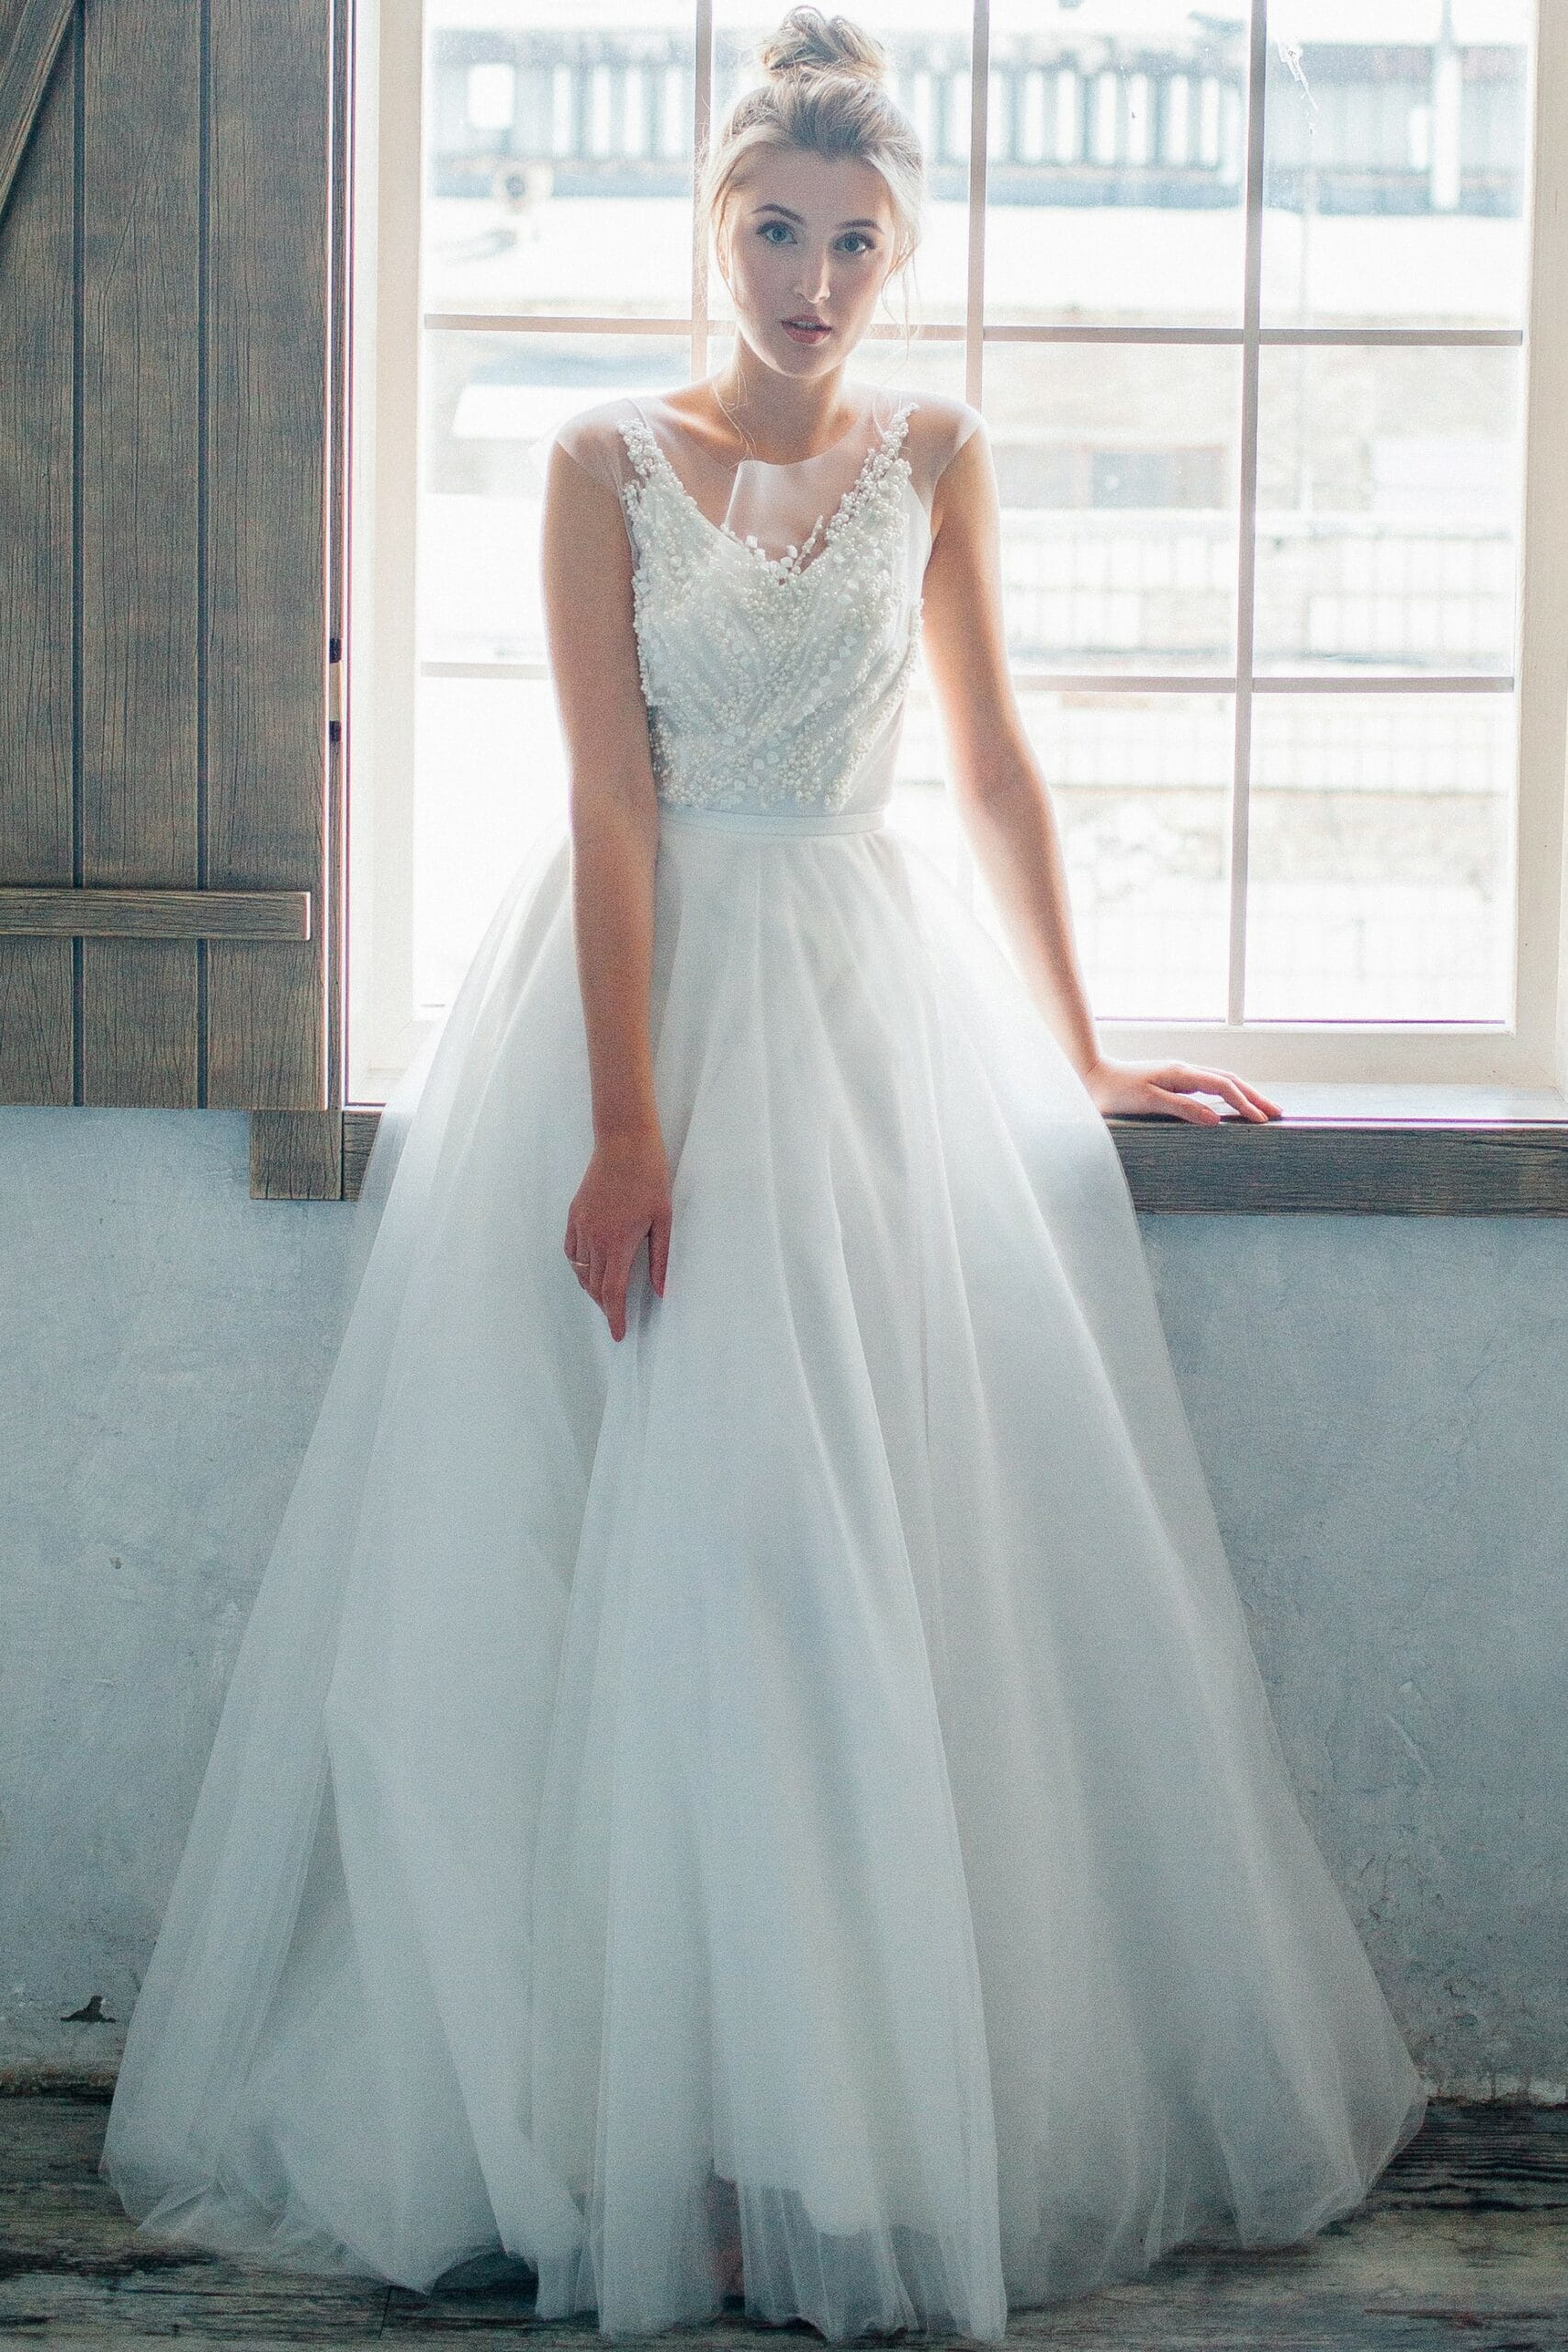 Свадебное платье MURIELA, коллекция THE ANGELS, бренд RARE BRIDAL, фото 2